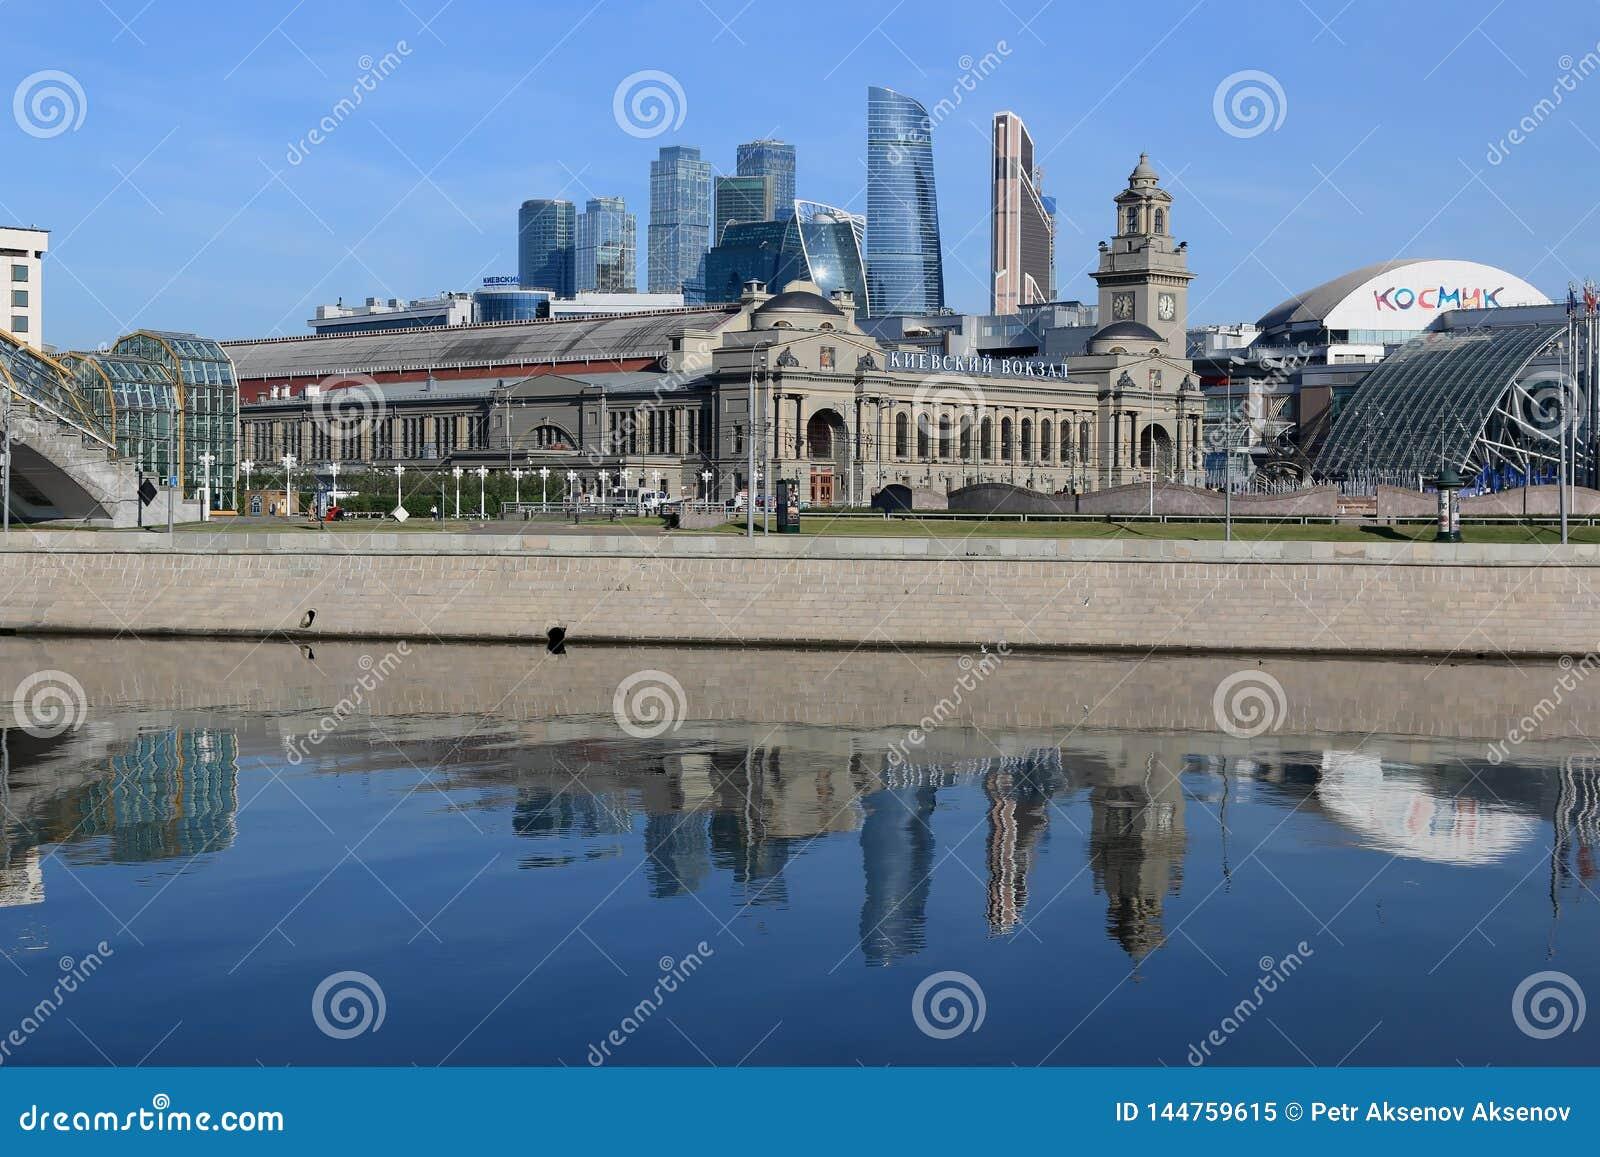 Moscou, Russie - 16 juin 2018 : Rivière de Moscou, remblai de Berezhkovskaya et gare ferroviaire de Kievsky pendant le matin